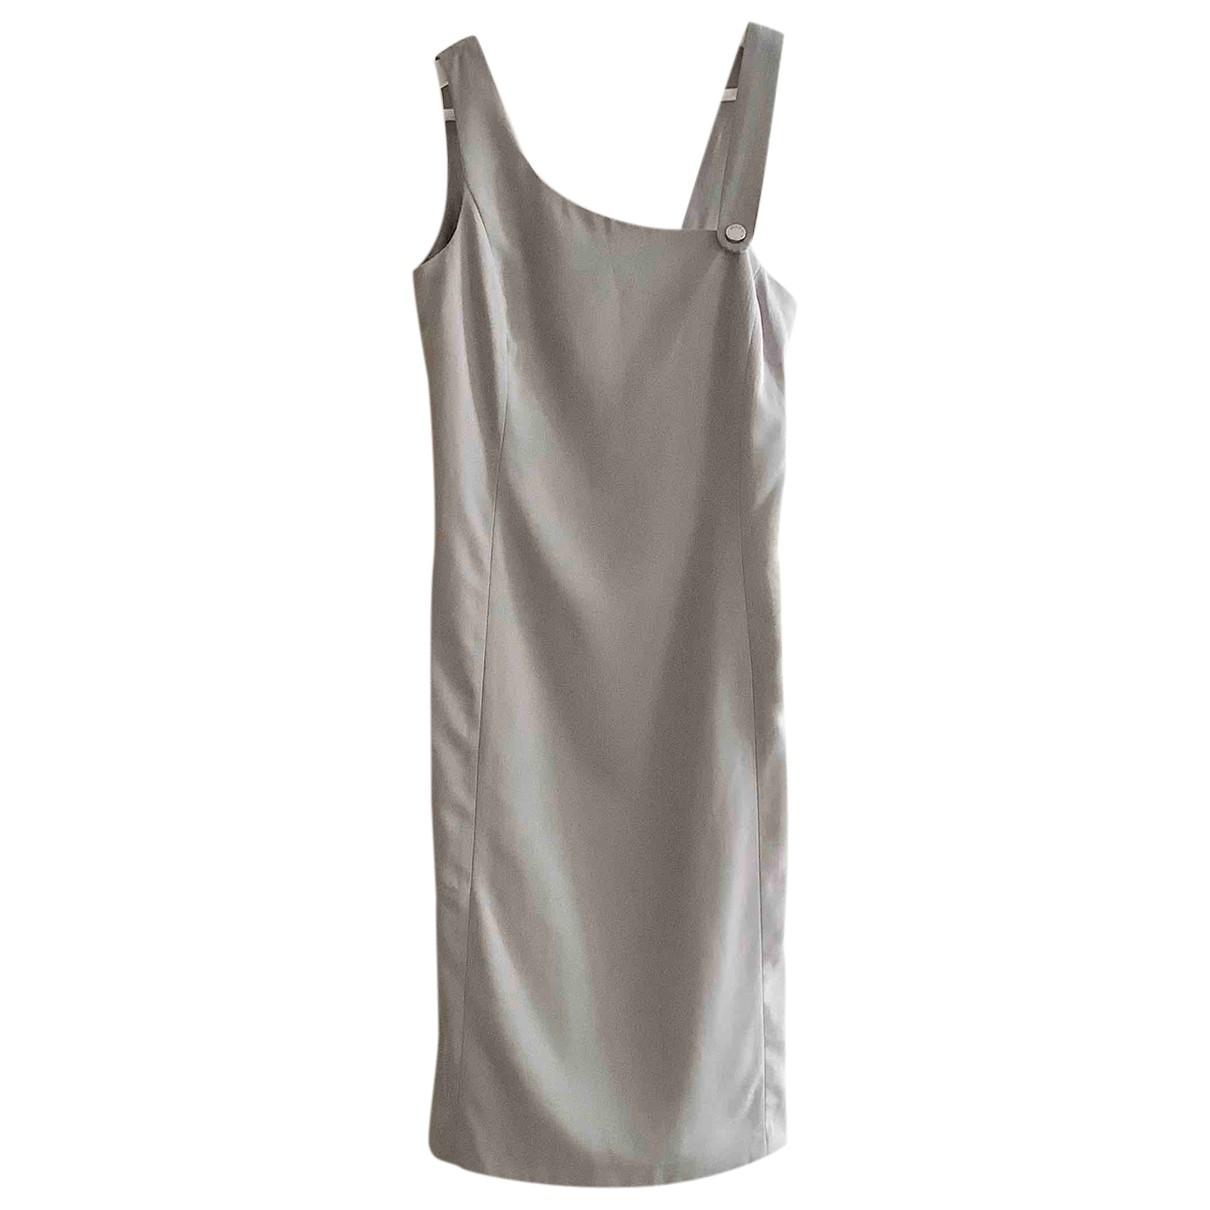 Paco Rabanne \N Grey dress for Women S International